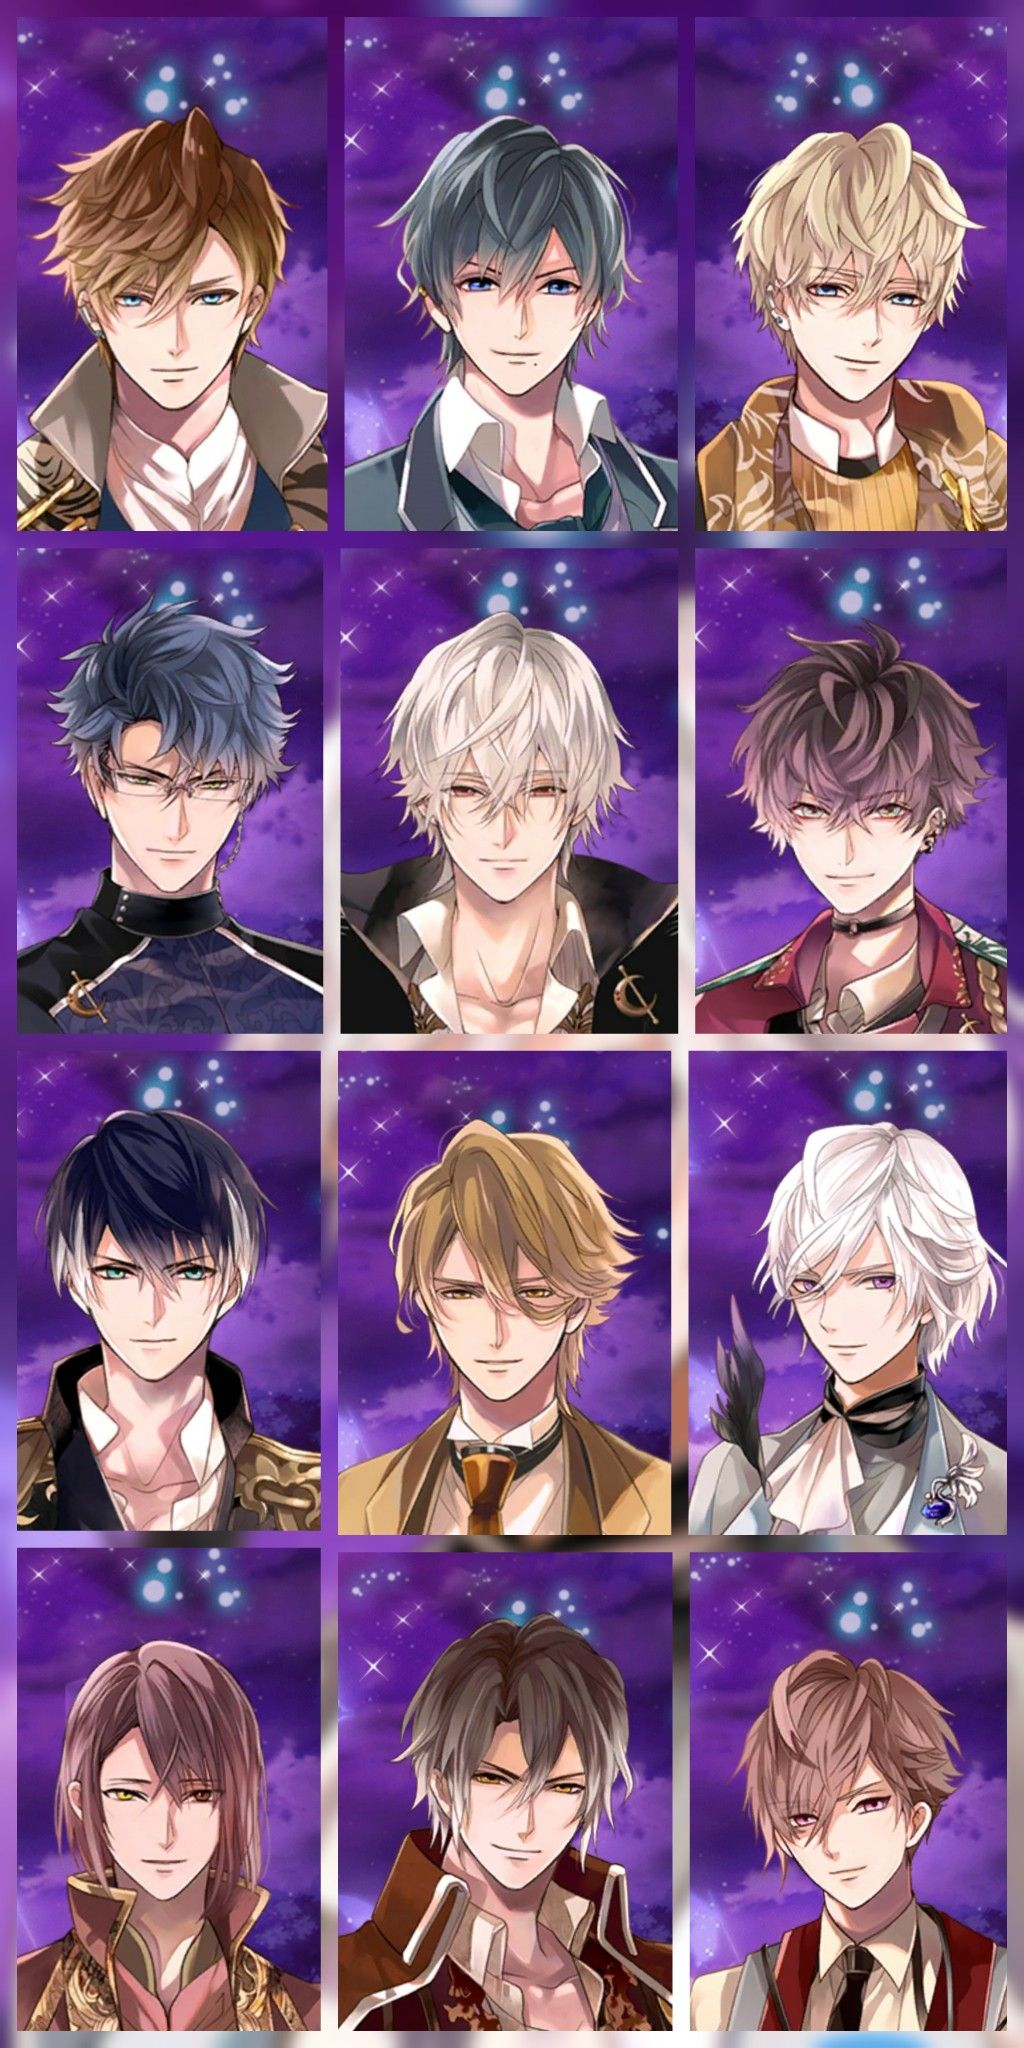 Nightmare Lovers Collage Anime Guys Anime Boy Hot Vampires